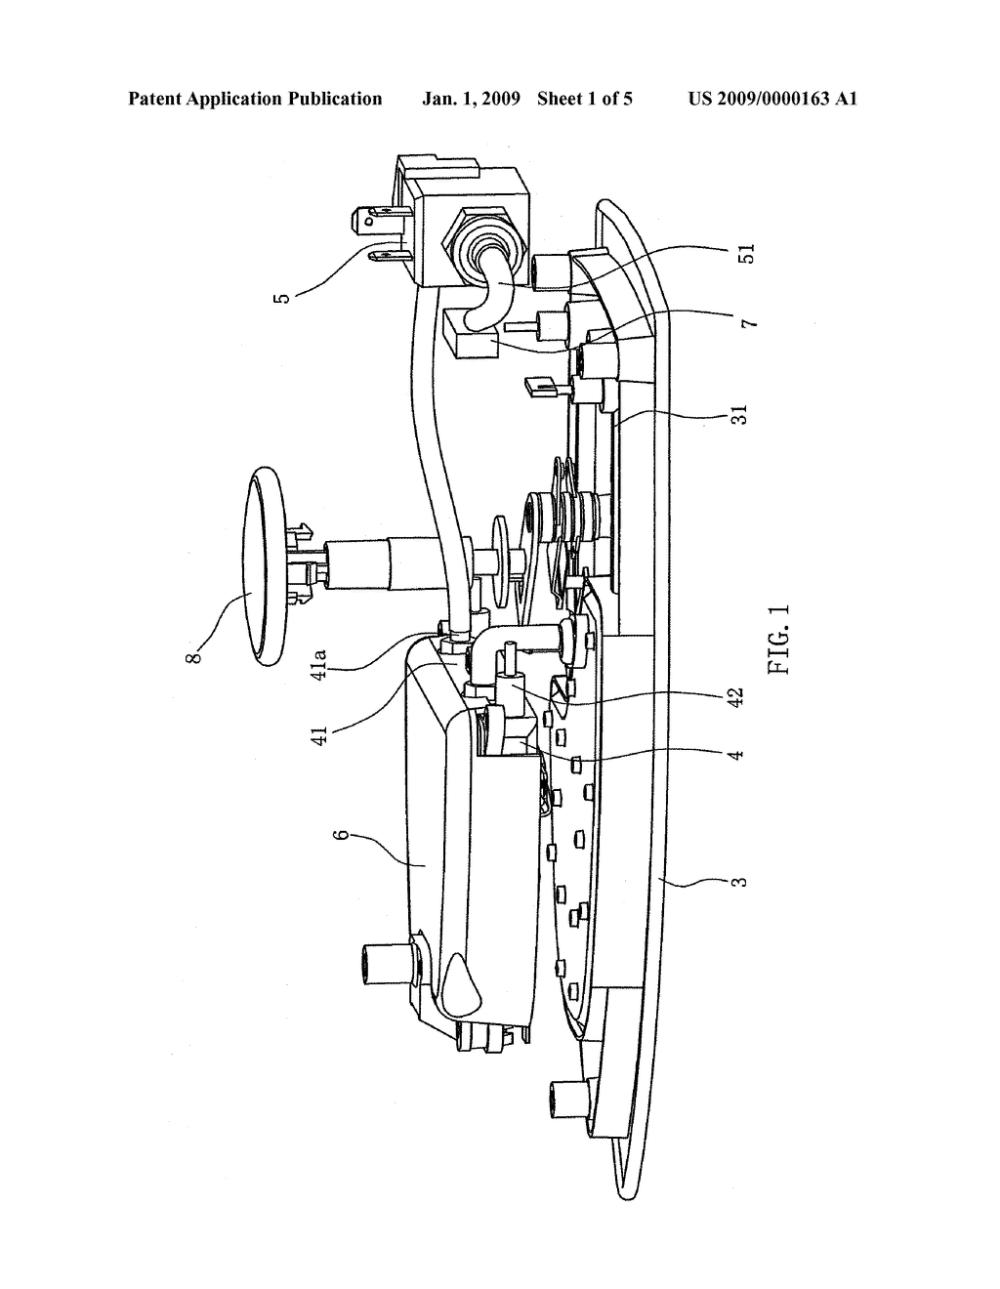 medium resolution of wiring diagram for steam iron wiring diagram loc wiring diagram for steam iron